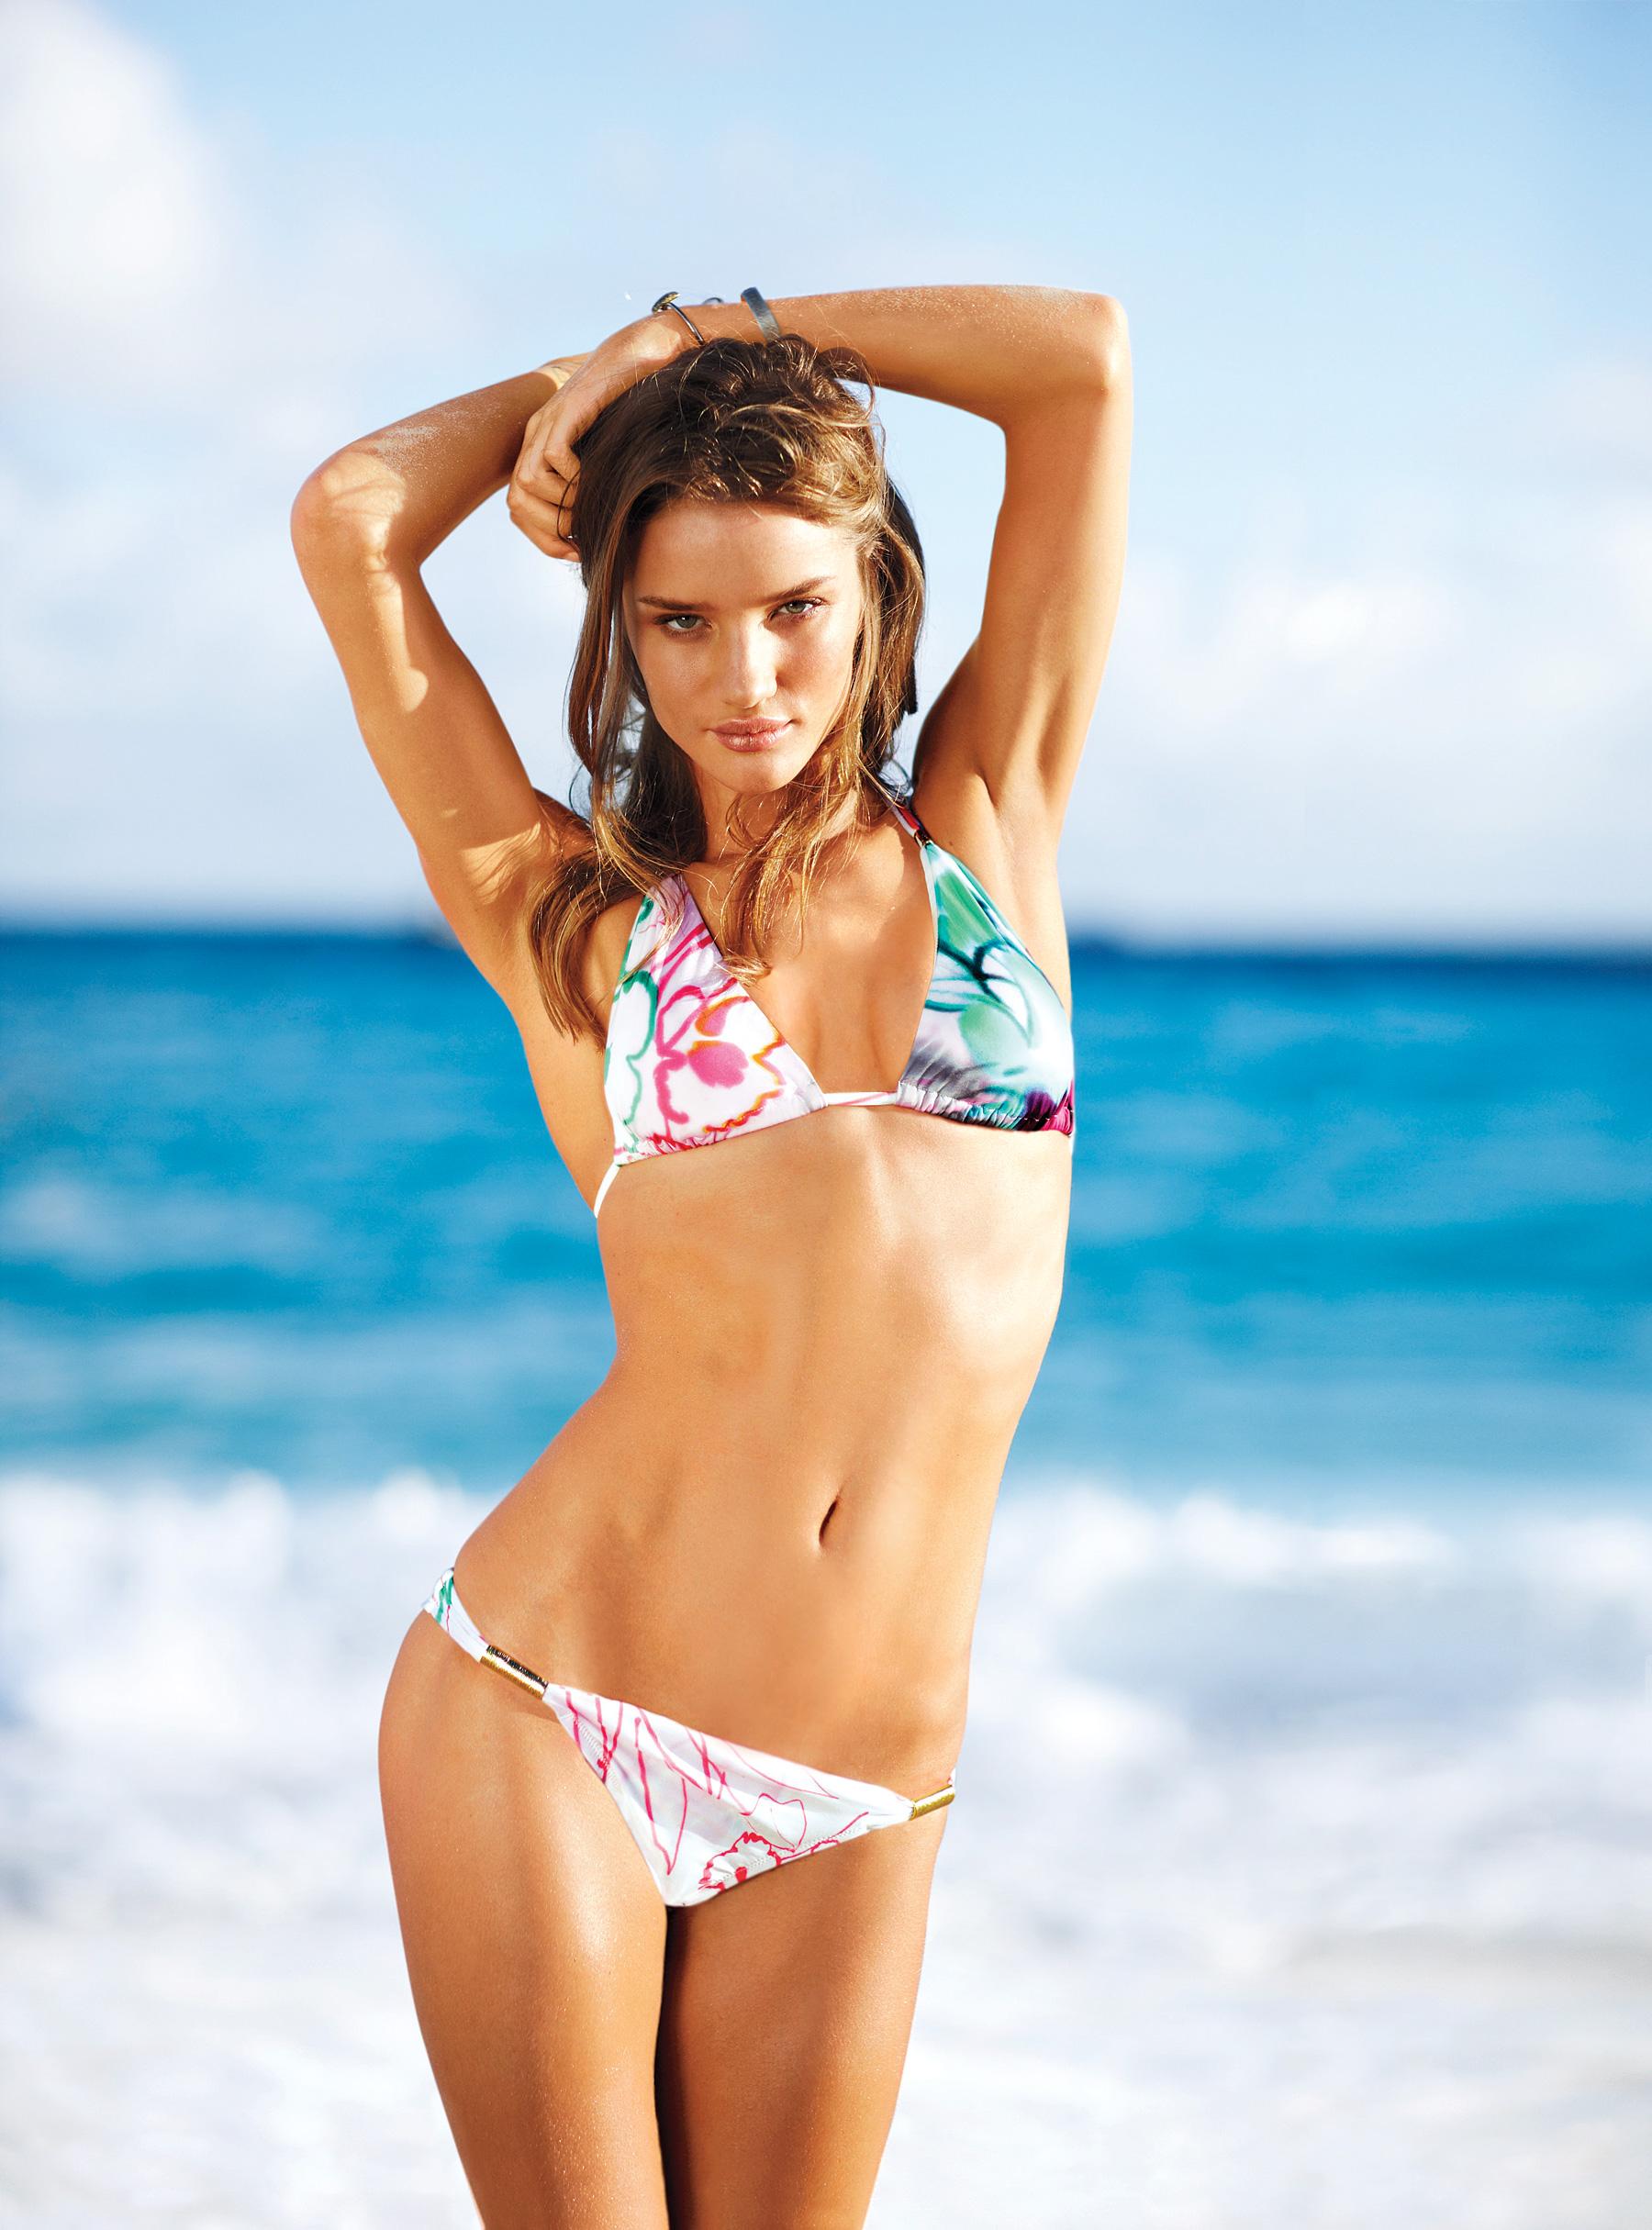 Digitalminx.com - Models - Rosie Huntington-Whiteley - Page 2 Rosie Huntington Whiteley Movies